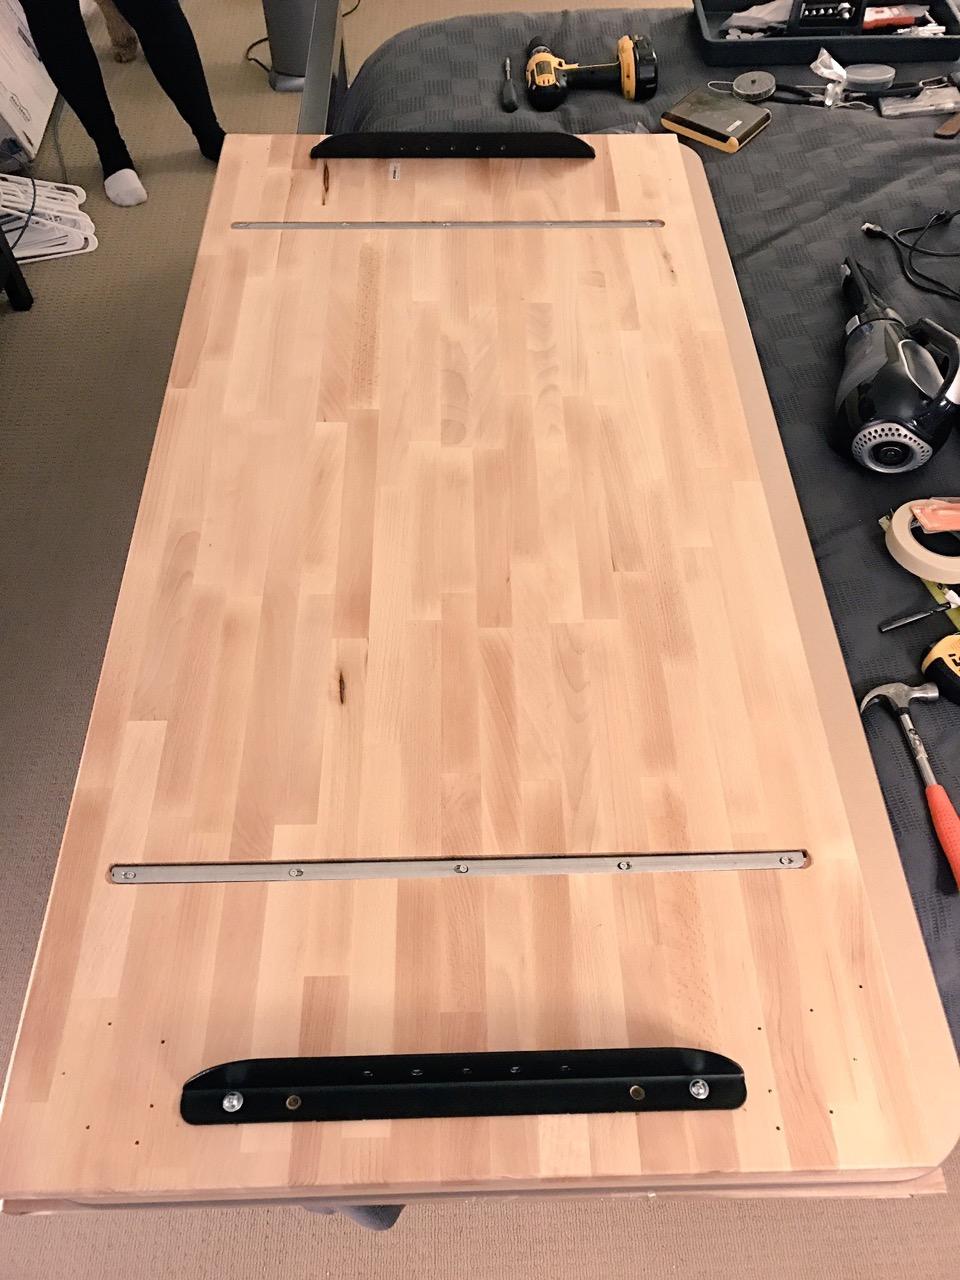 in progress attaching rails